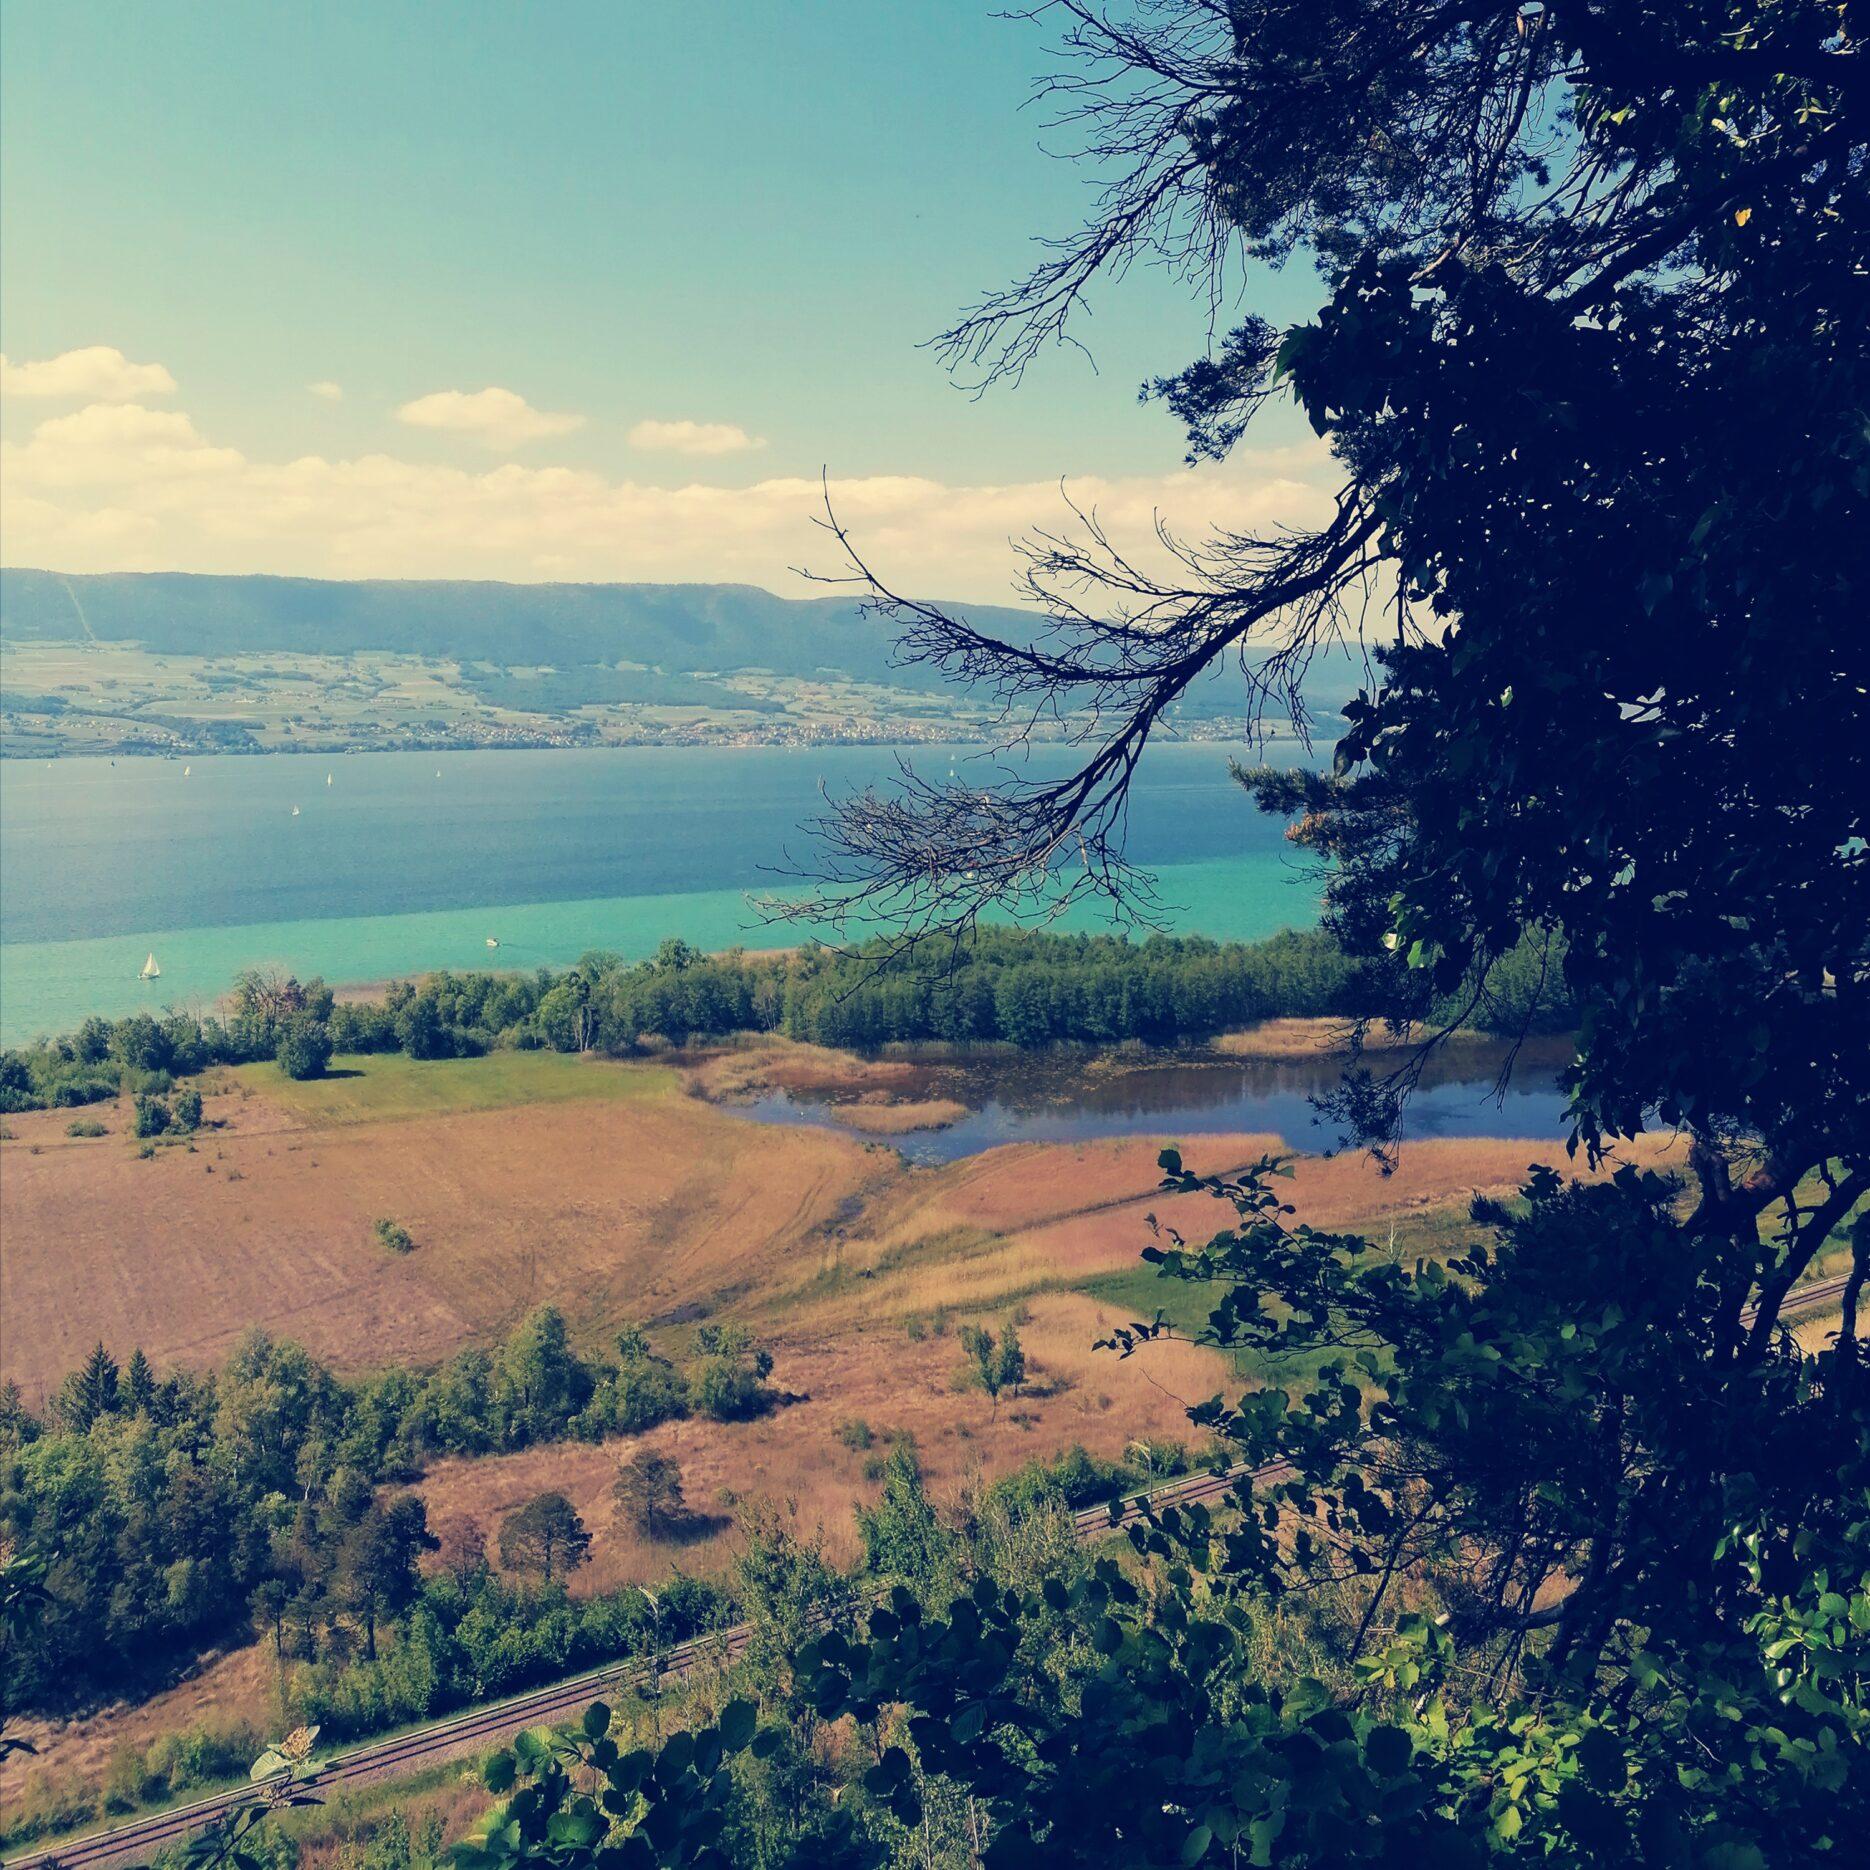 05.17.20 Lac Neuchatel